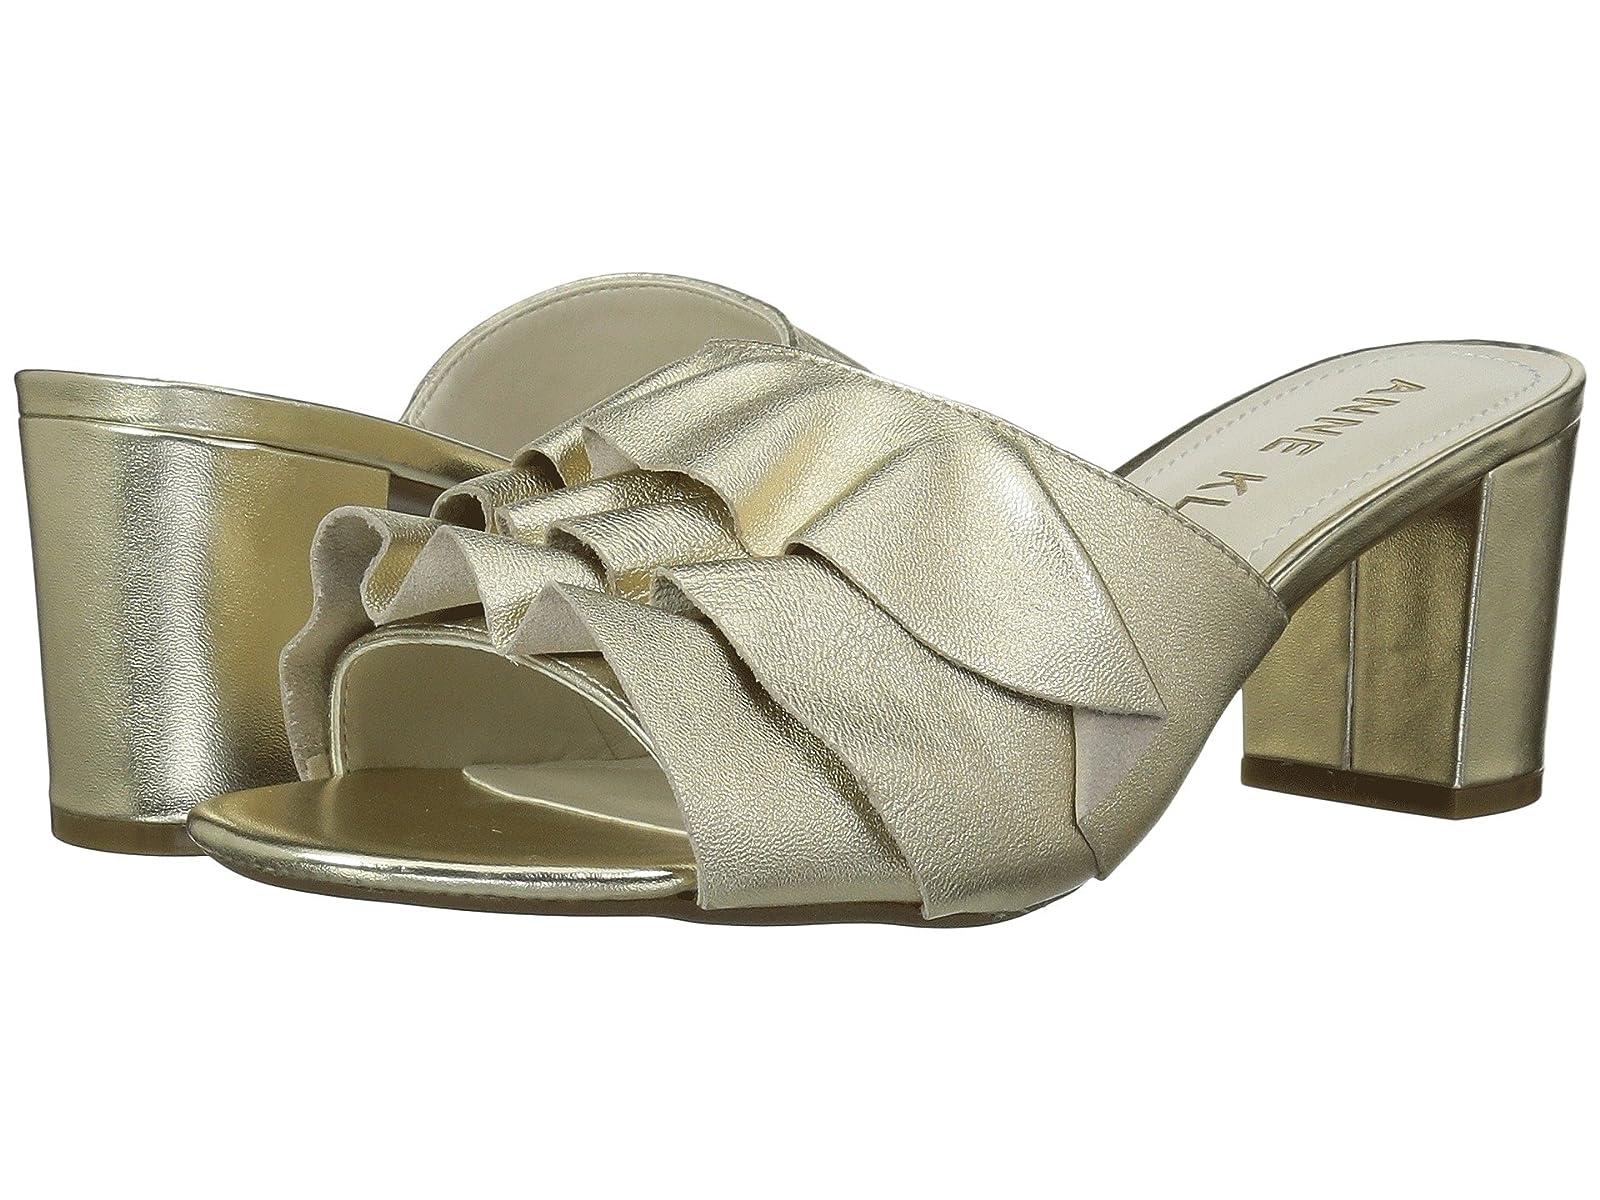 Anne Klein CeriseAtmospheric grades have affordable shoes